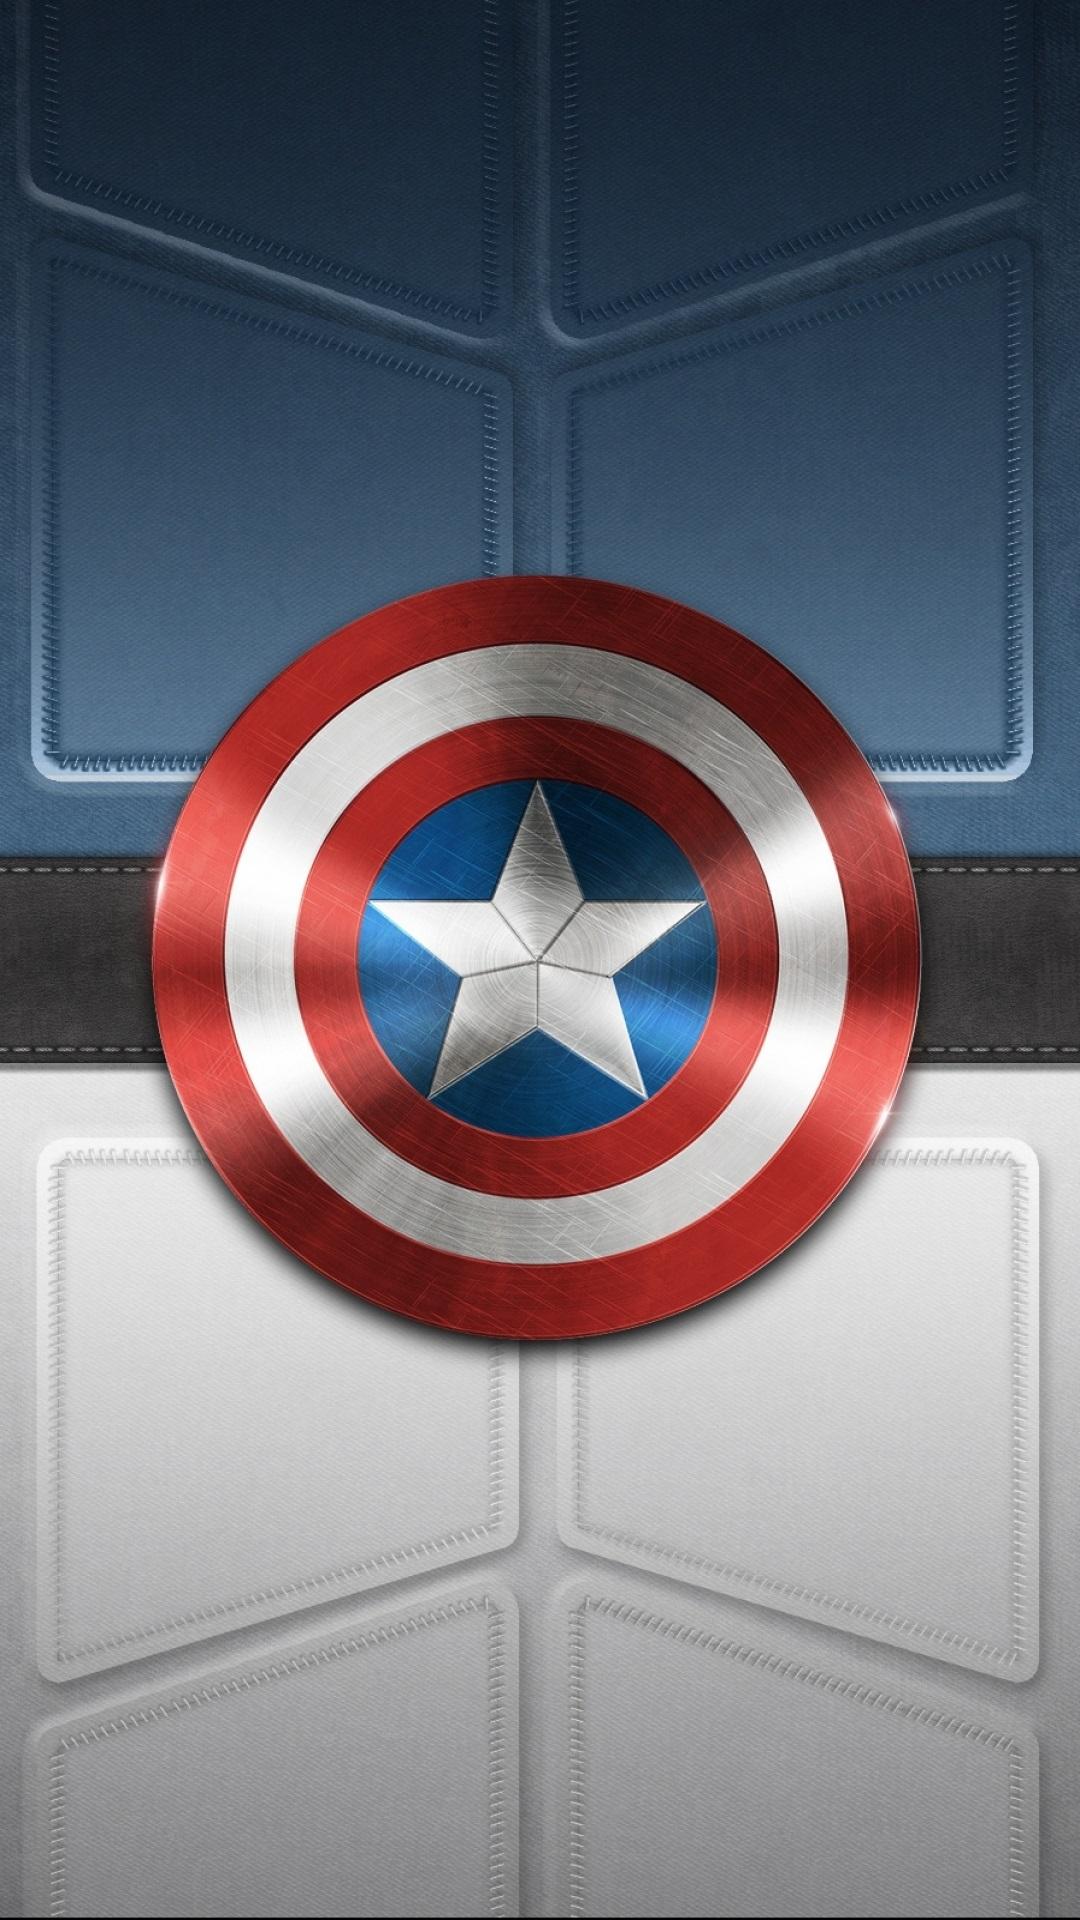 Iphone 6s Wallpaper Hd Quotes Captain America Iphone Backgrounds Pixelstalk Net